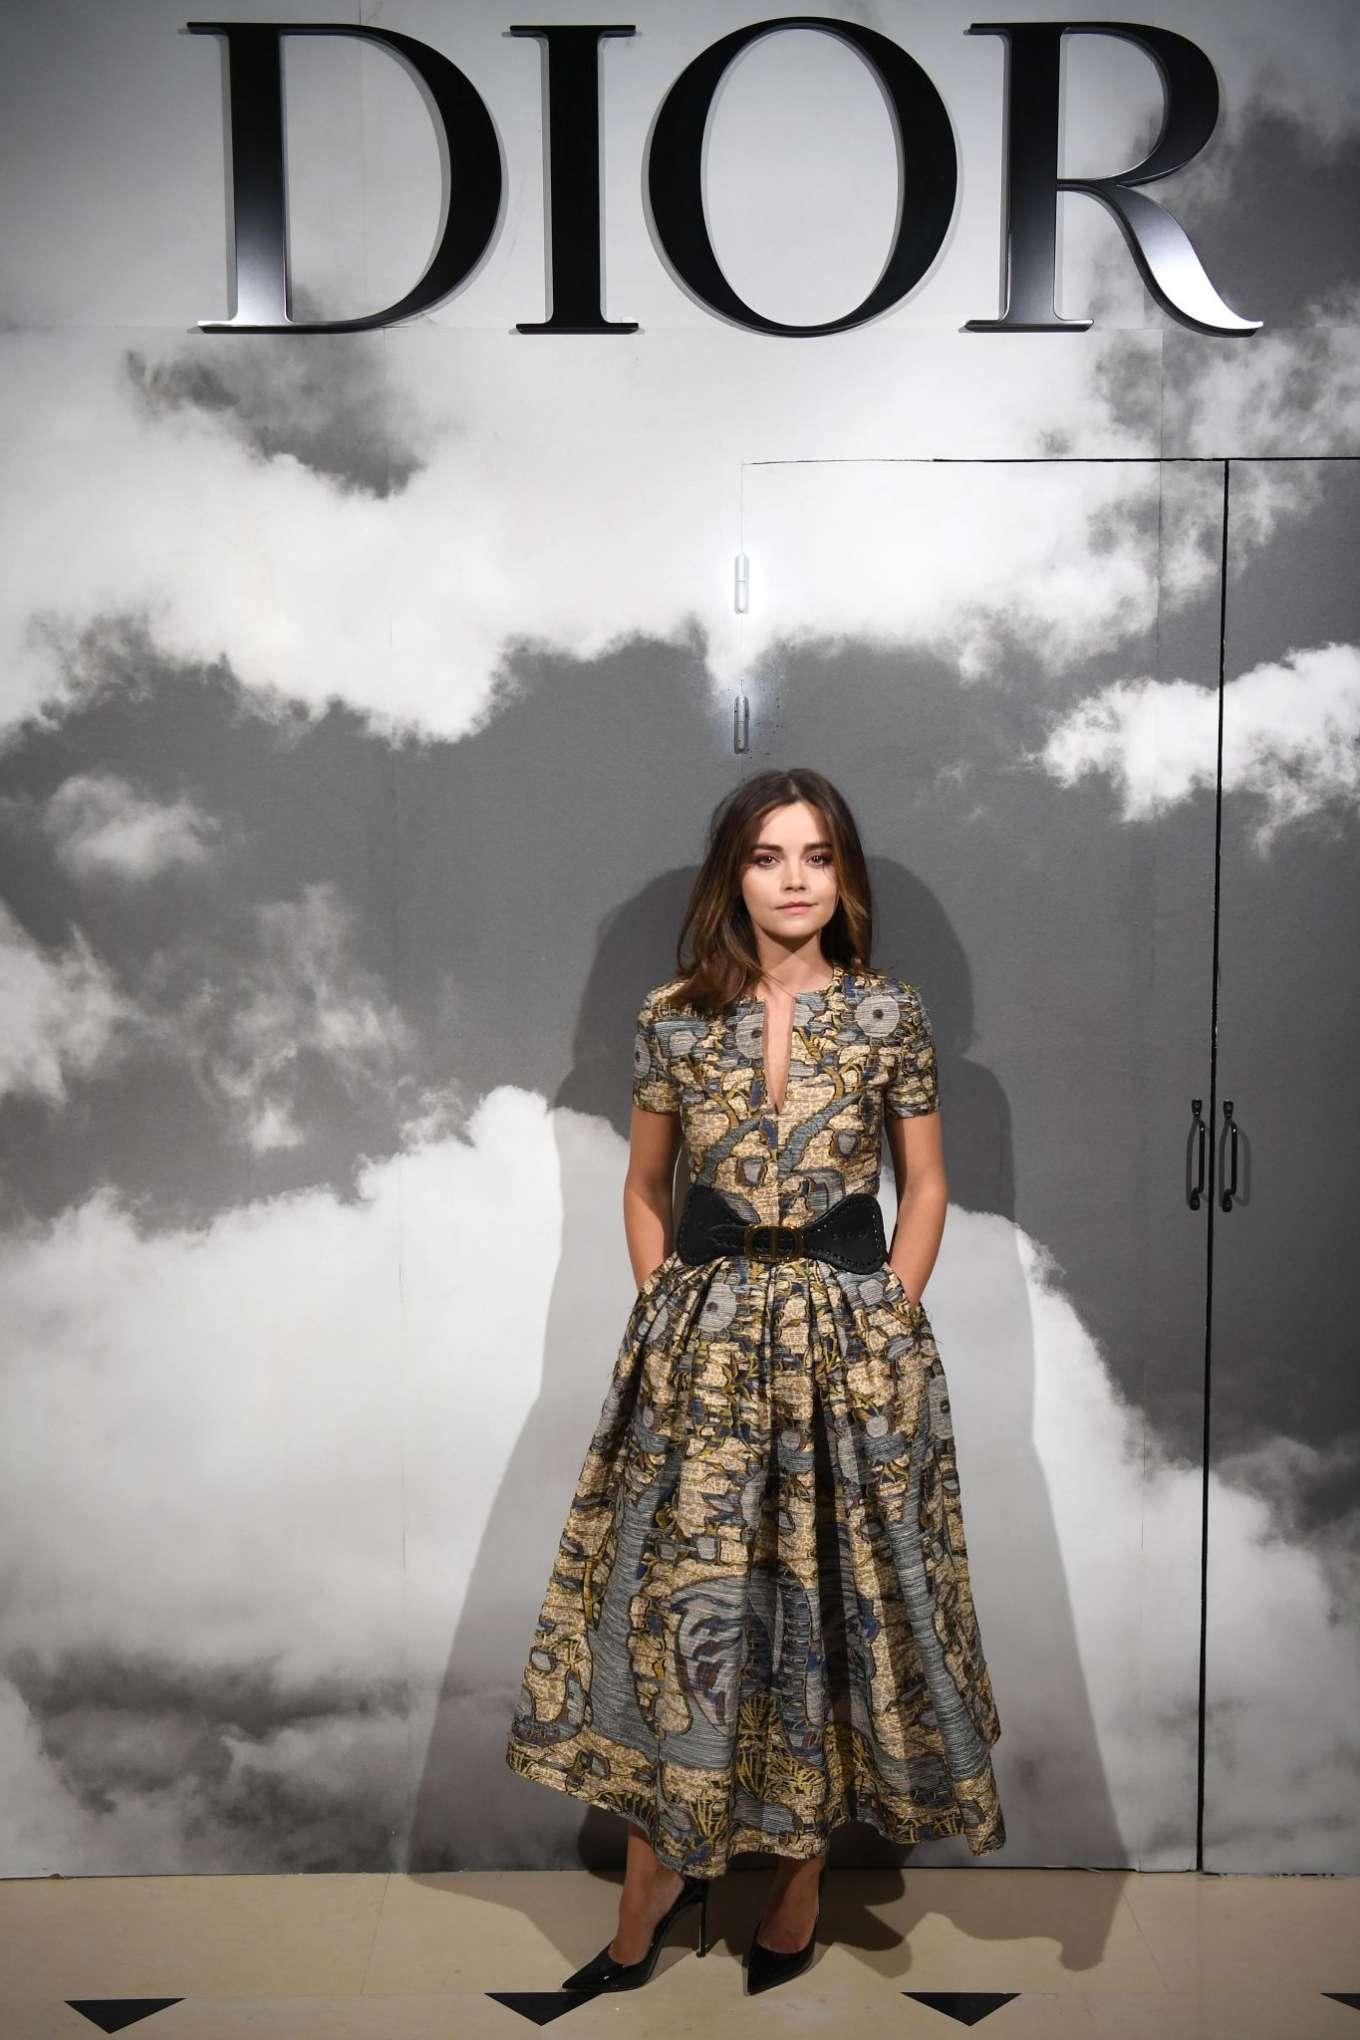 Jenna-Louise Coleman 2019 : Jenna Coleman – 2019 Paris Fashion Week – Christian Dior Haute Couture FW 19-20-05